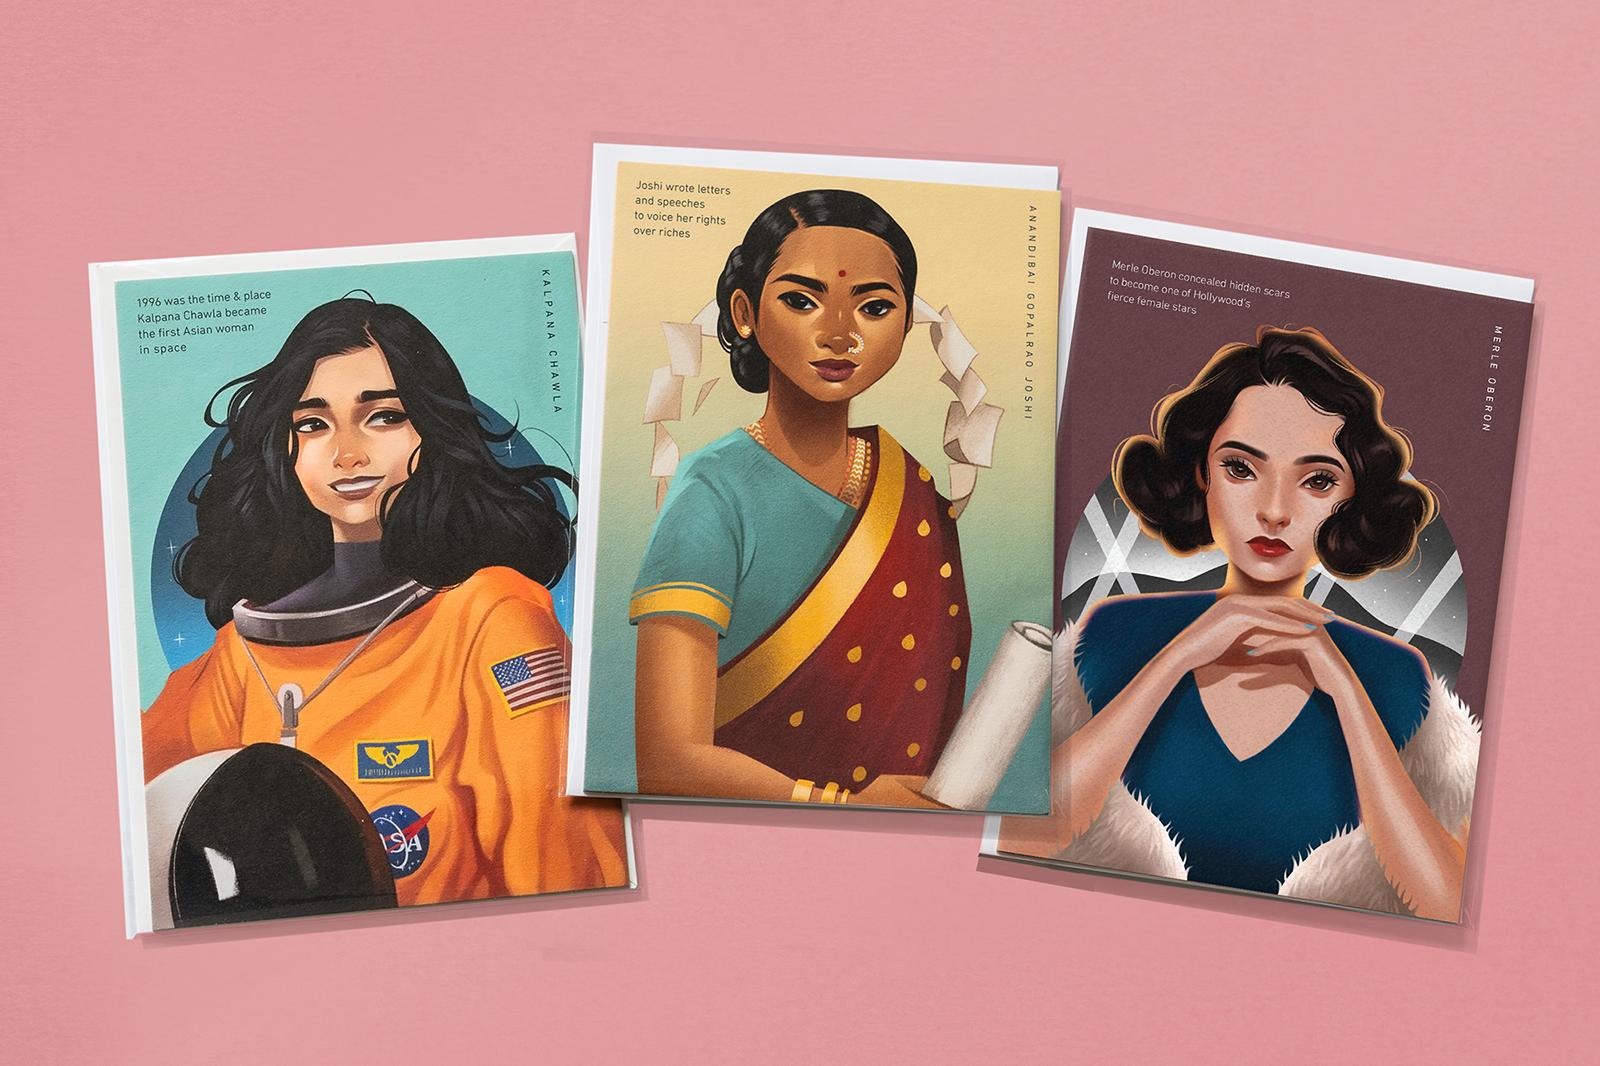 Hello Prosper South Asian women pioneers of Kalpana Chawla, Anandibai Gopalrao Joshi, Merle Oberon